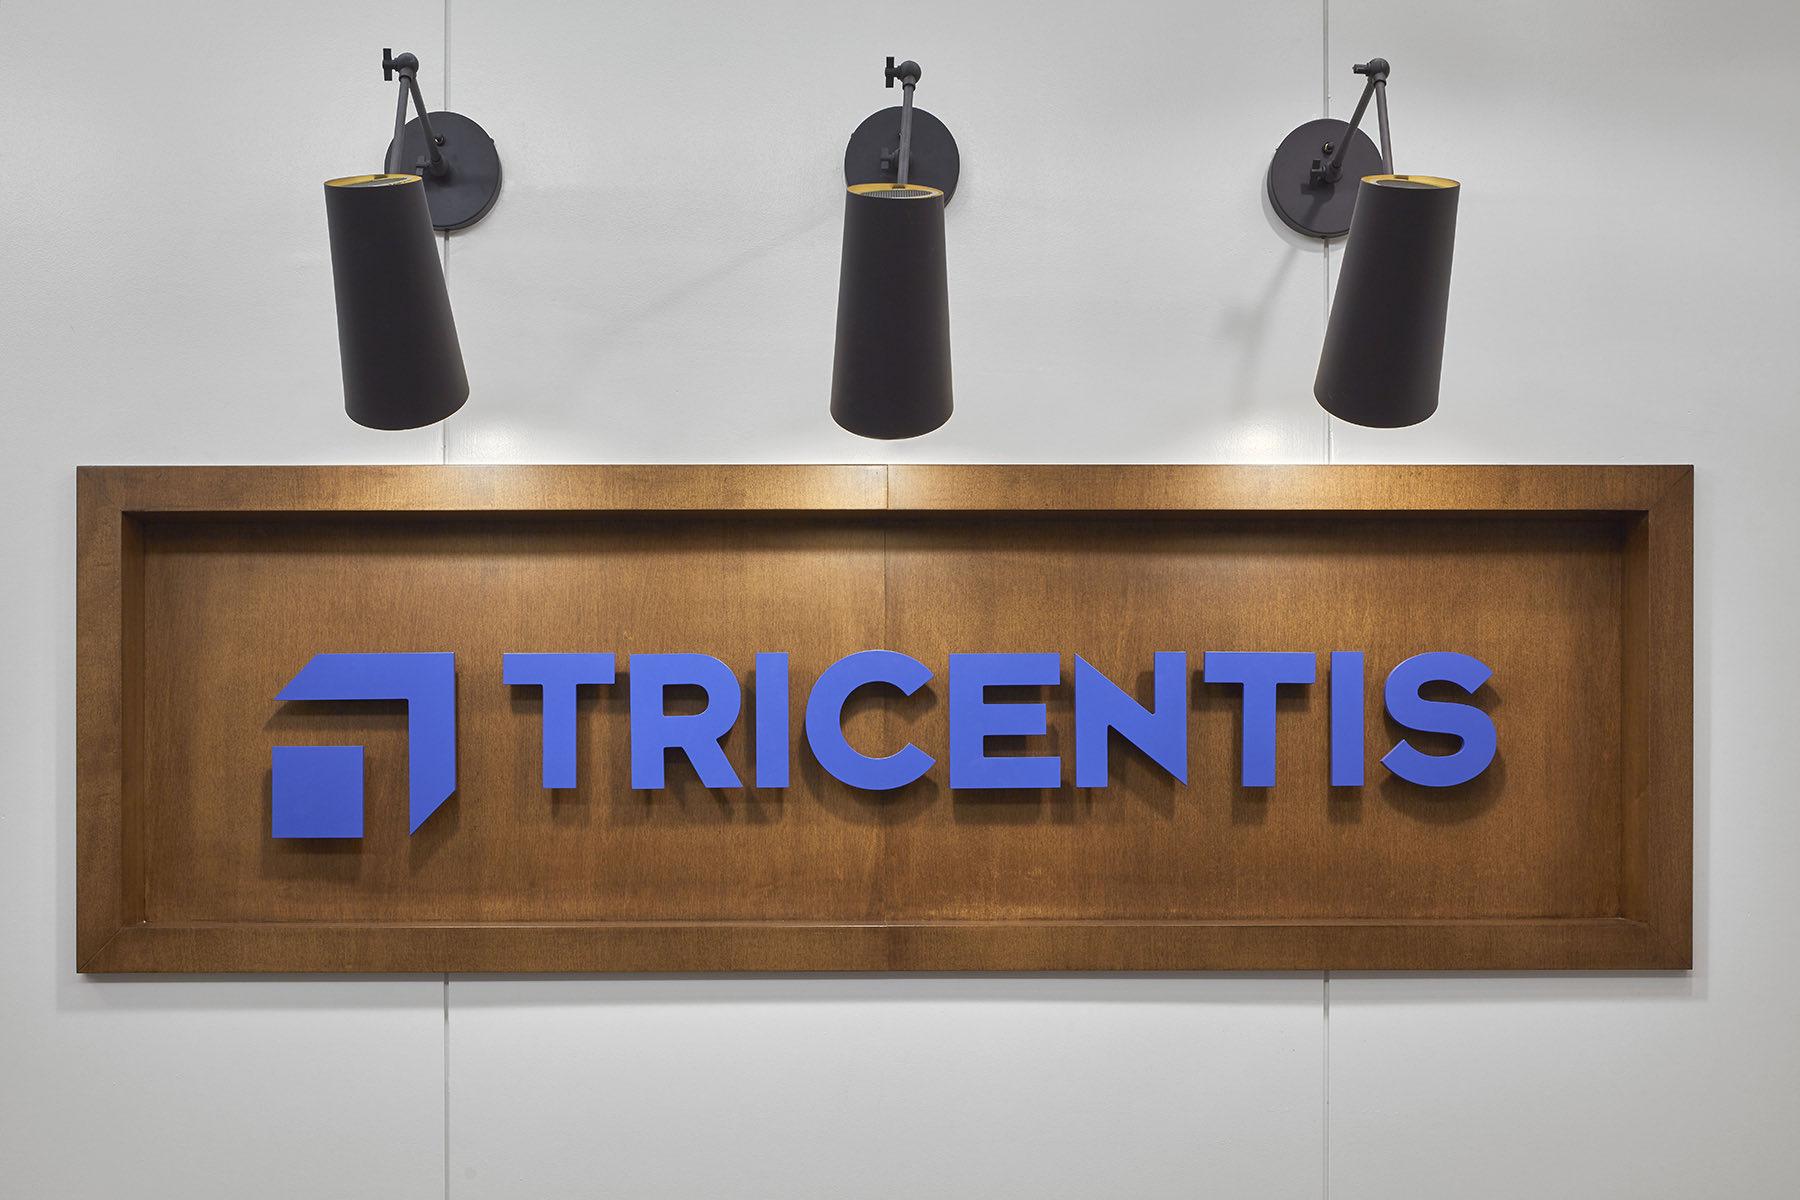 tricentis-atlanta-office-17